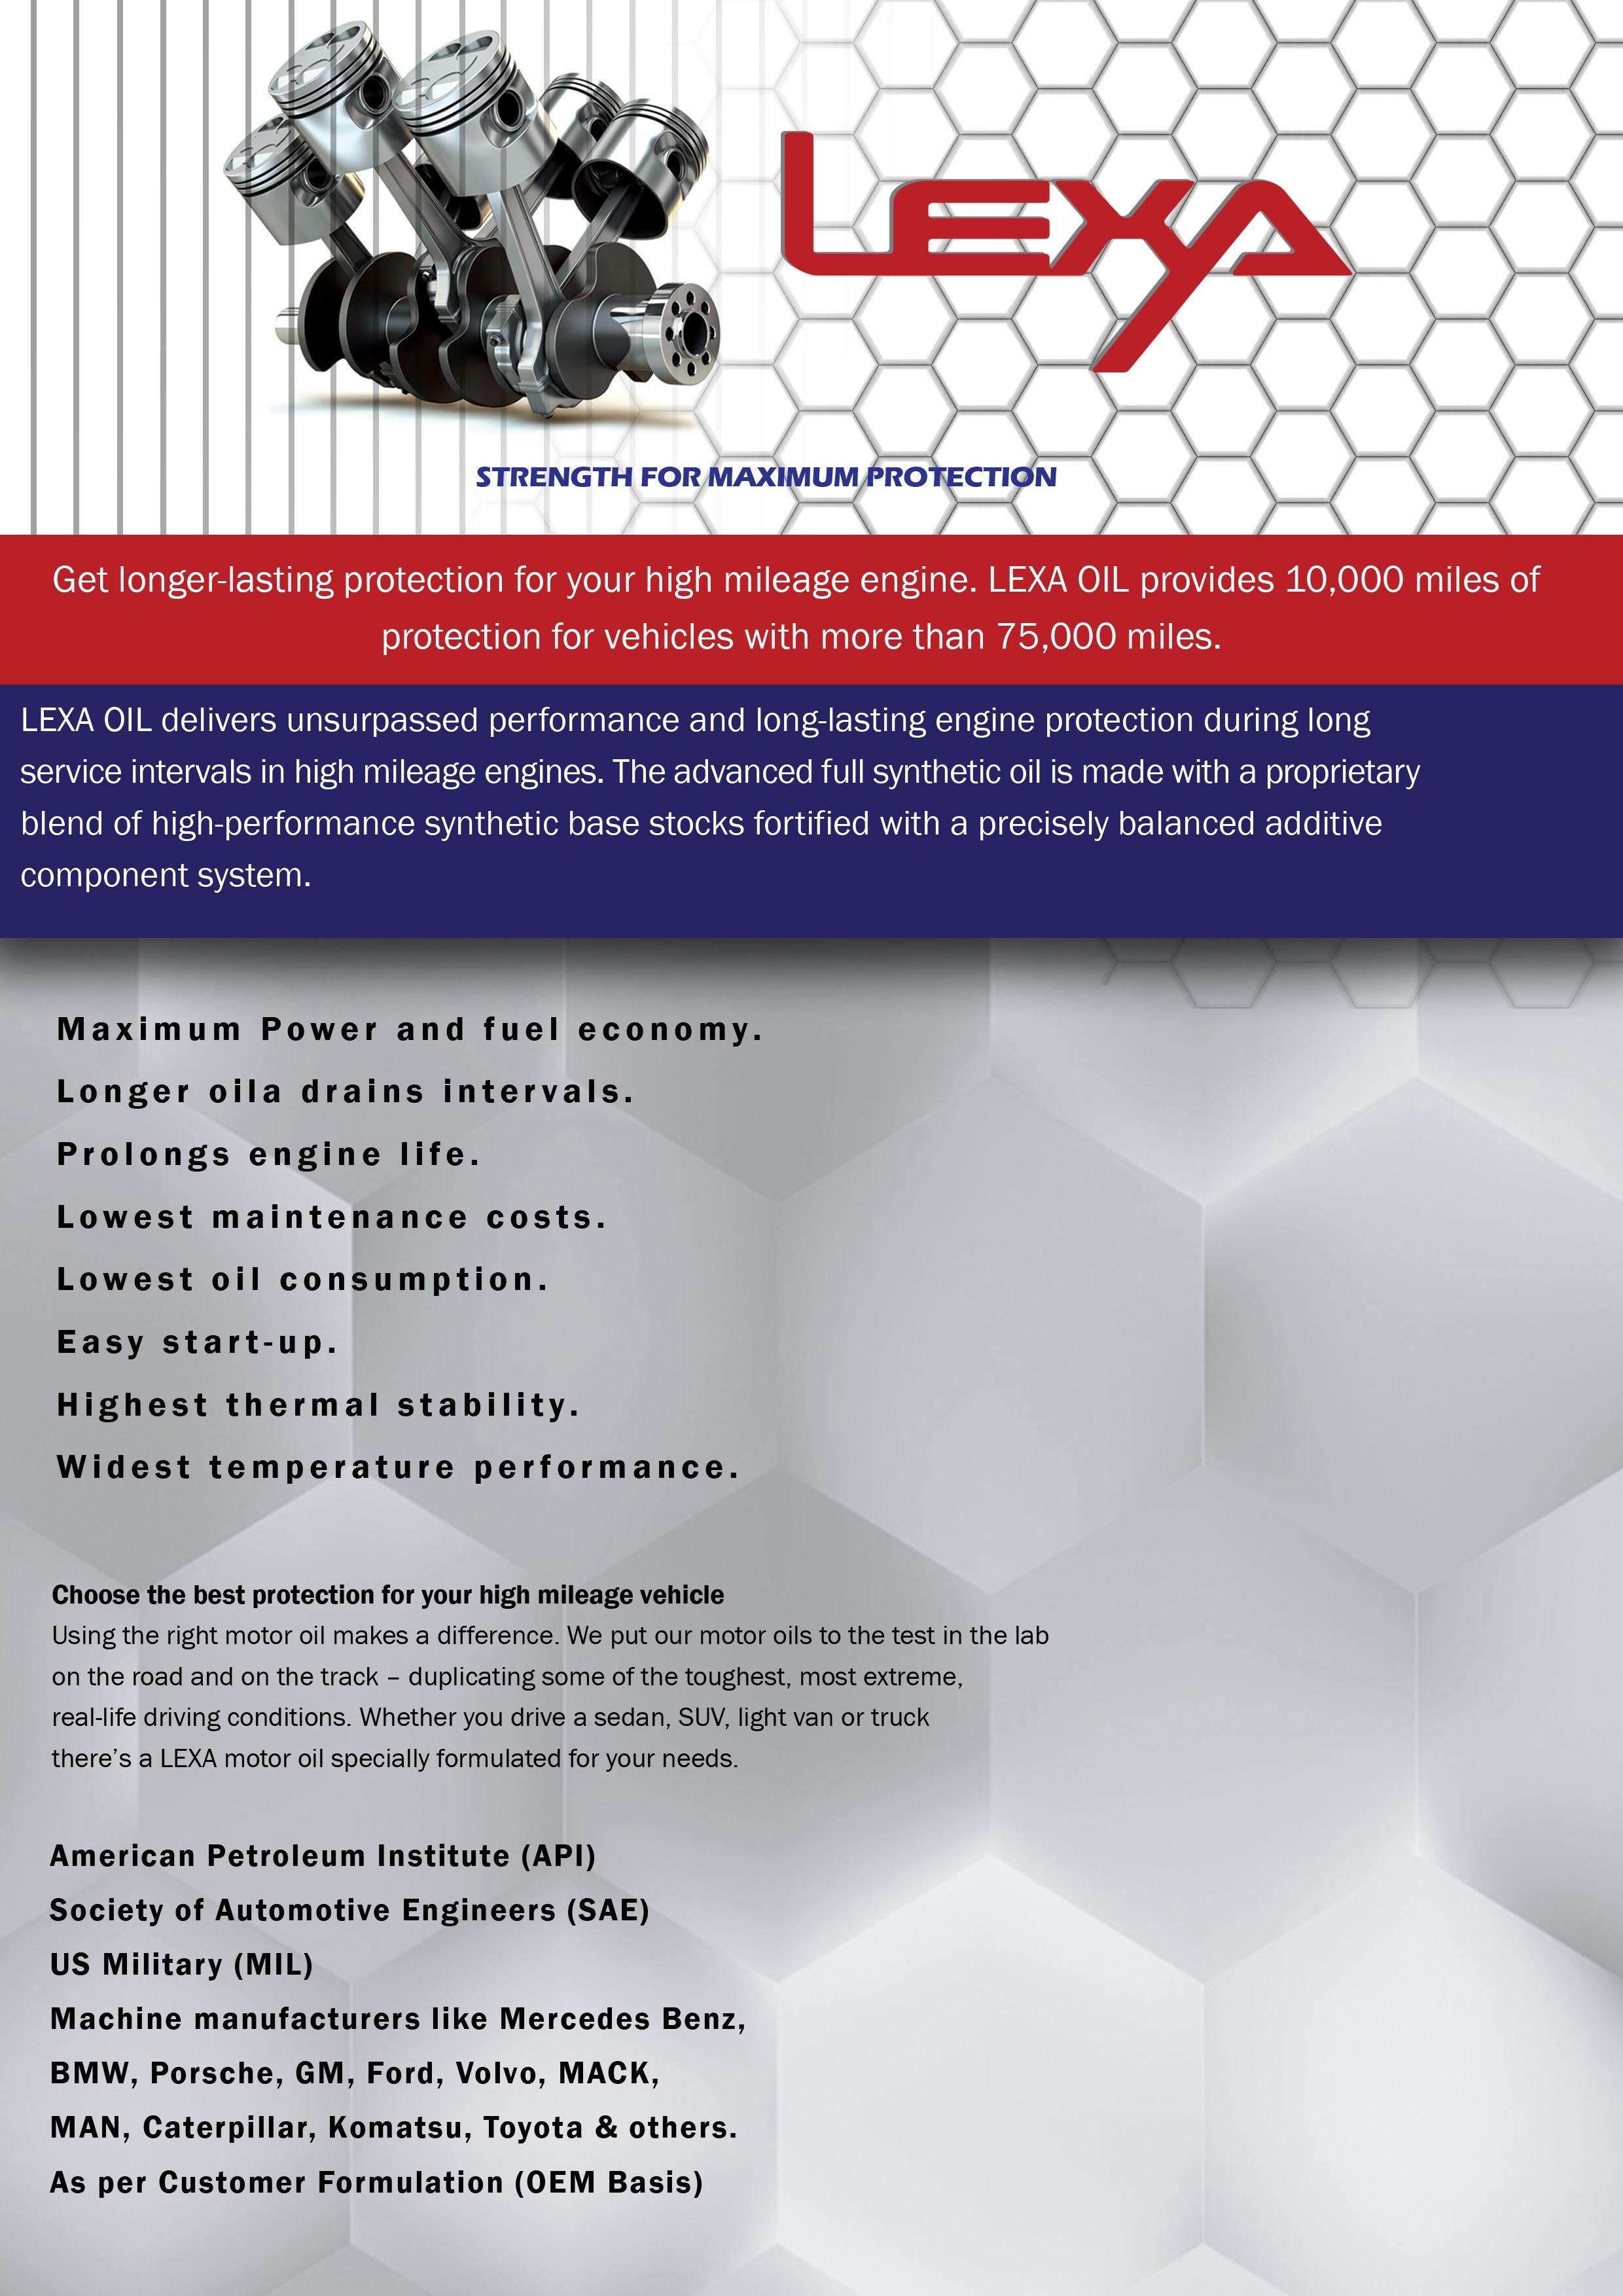 Pin By Lexa Oil On Lexa Oil Synthetic Oil Oils 10 Things